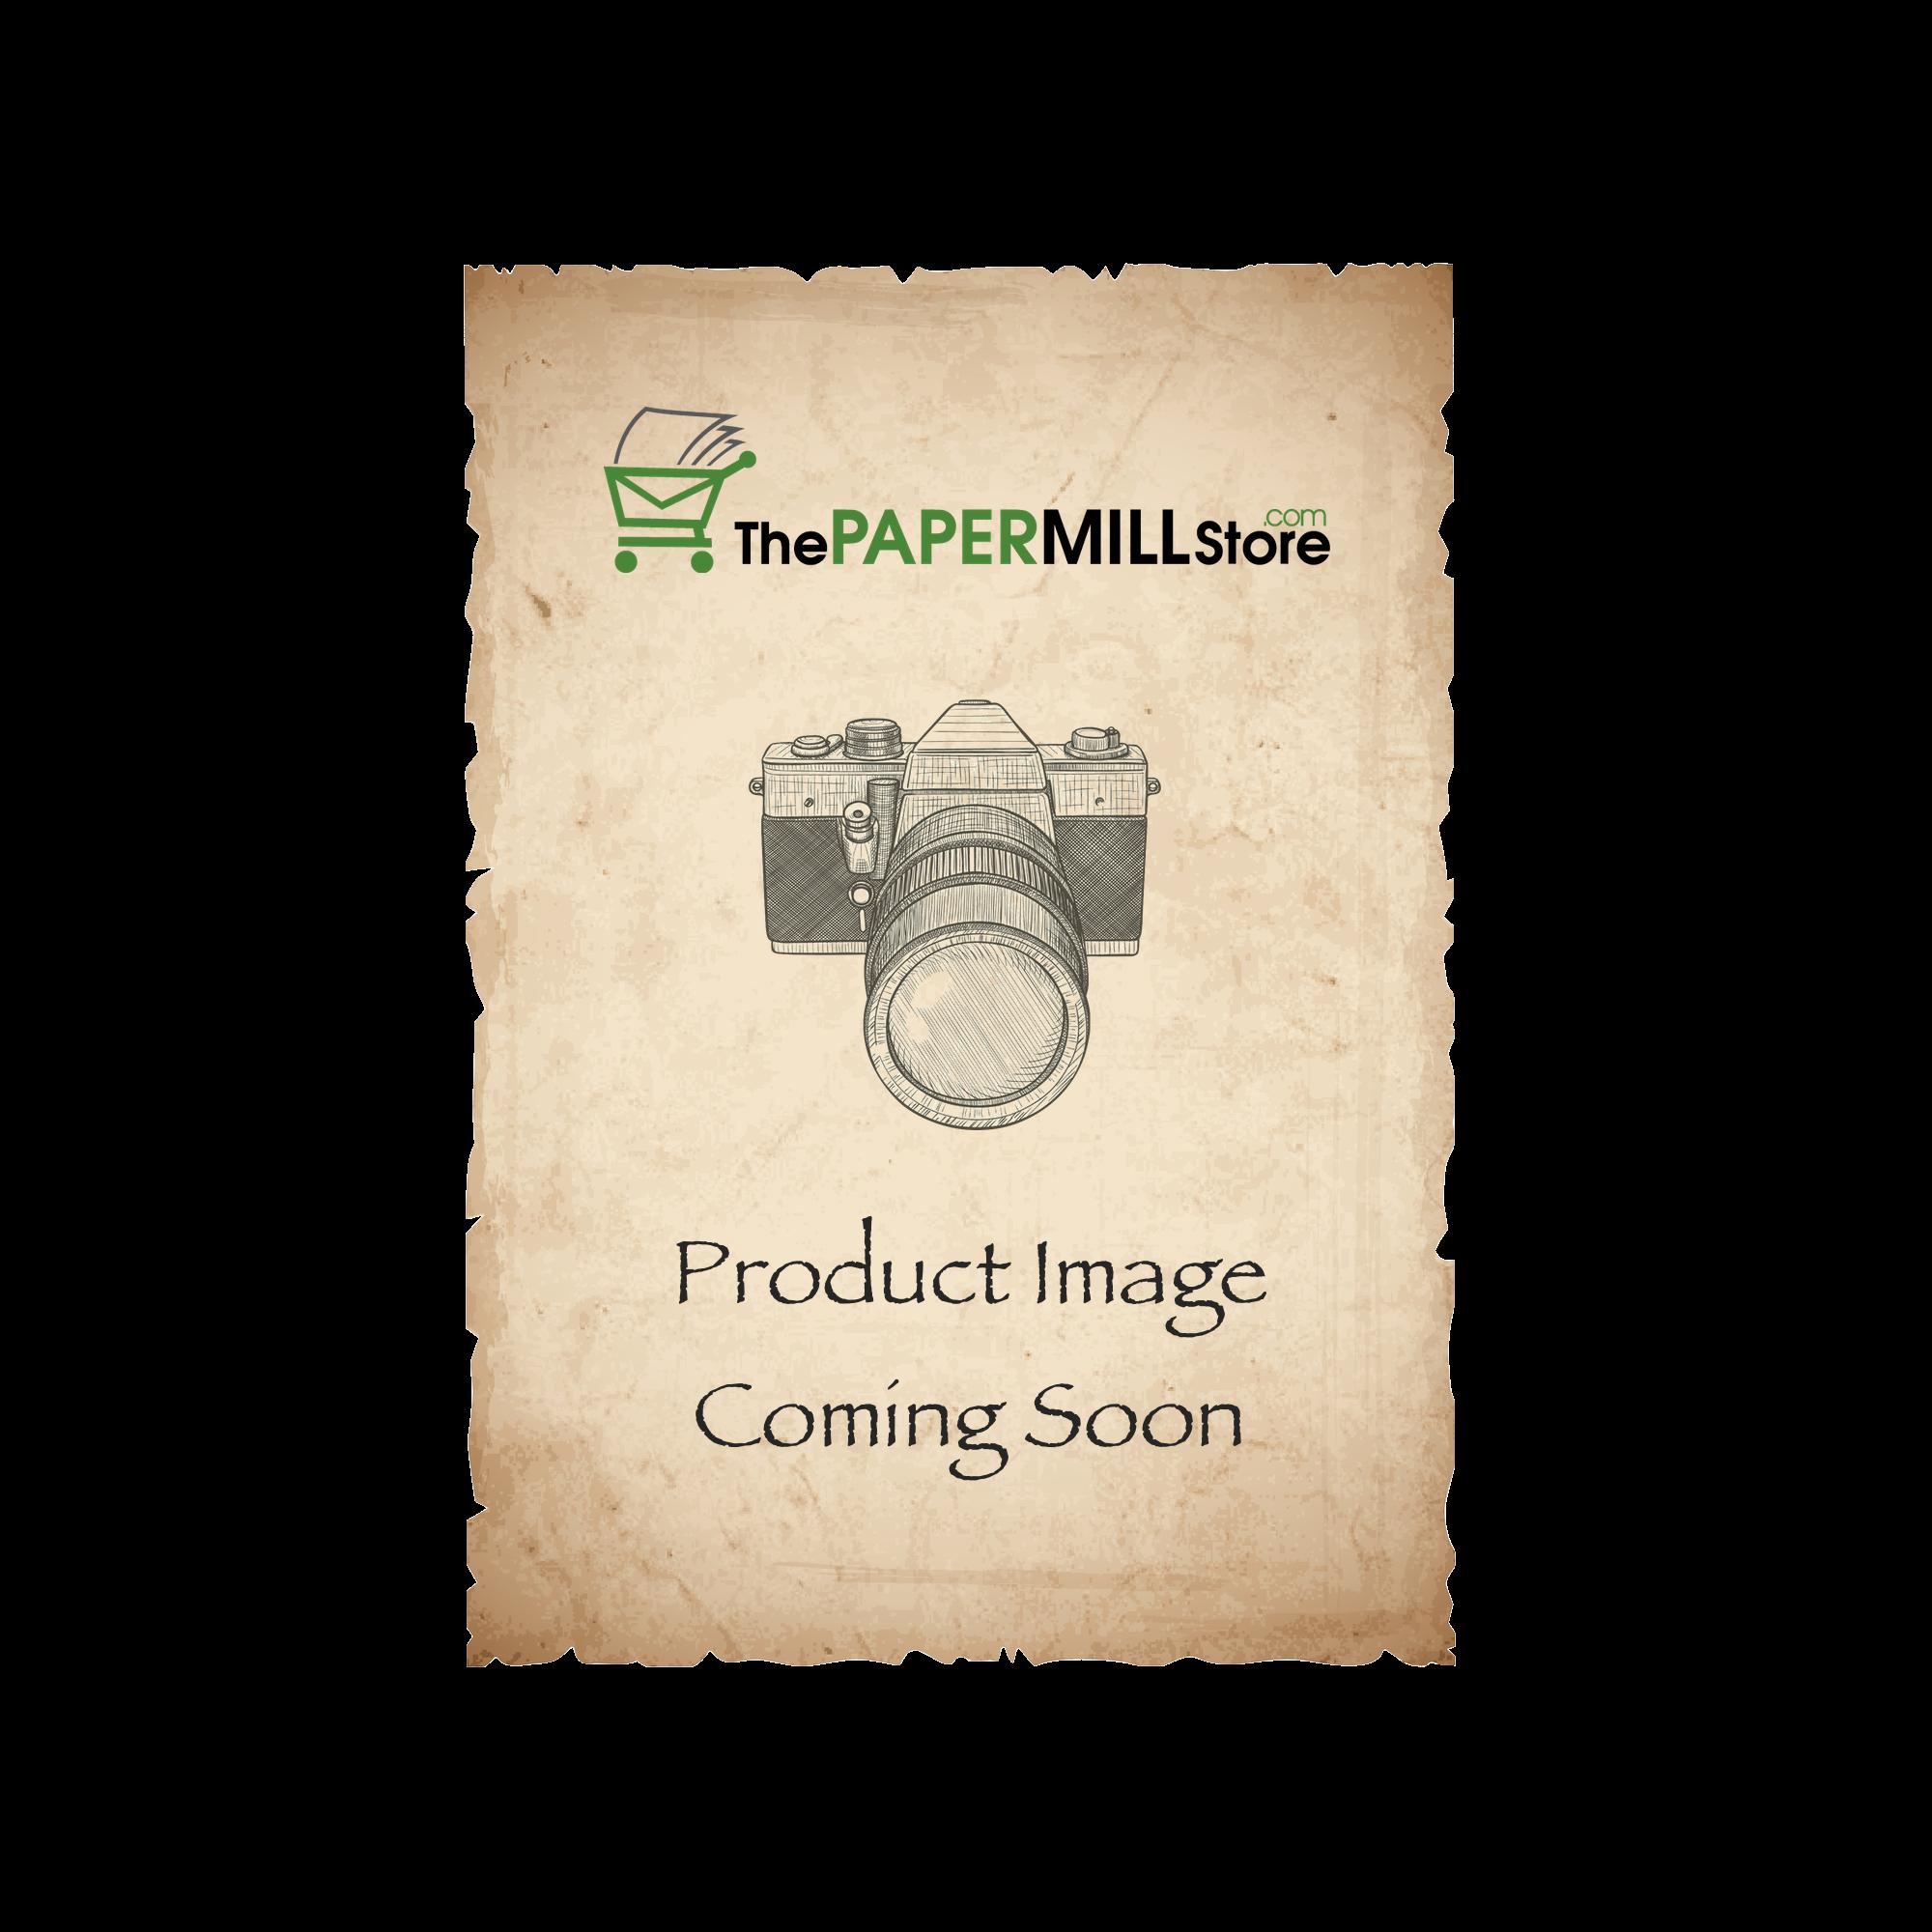 Loop Antique Vellum Iris Envelopes - A7 (5 1/4 x 7 1/4) 80 lb Text Antique Vellum  50% Recycled 250 per Box